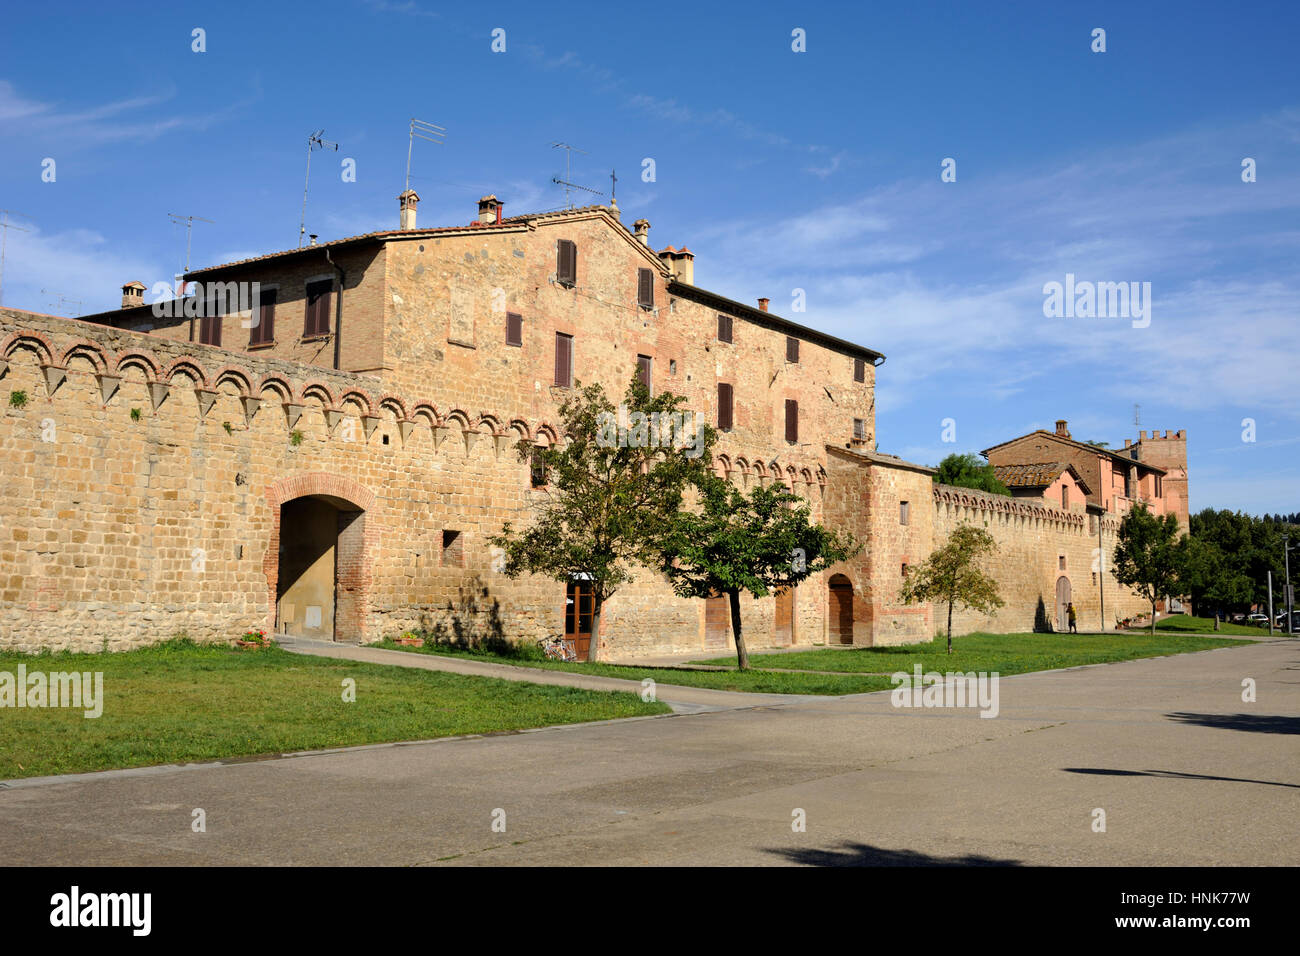 Italie, Toscane, buonconvento, murs Photo Stock